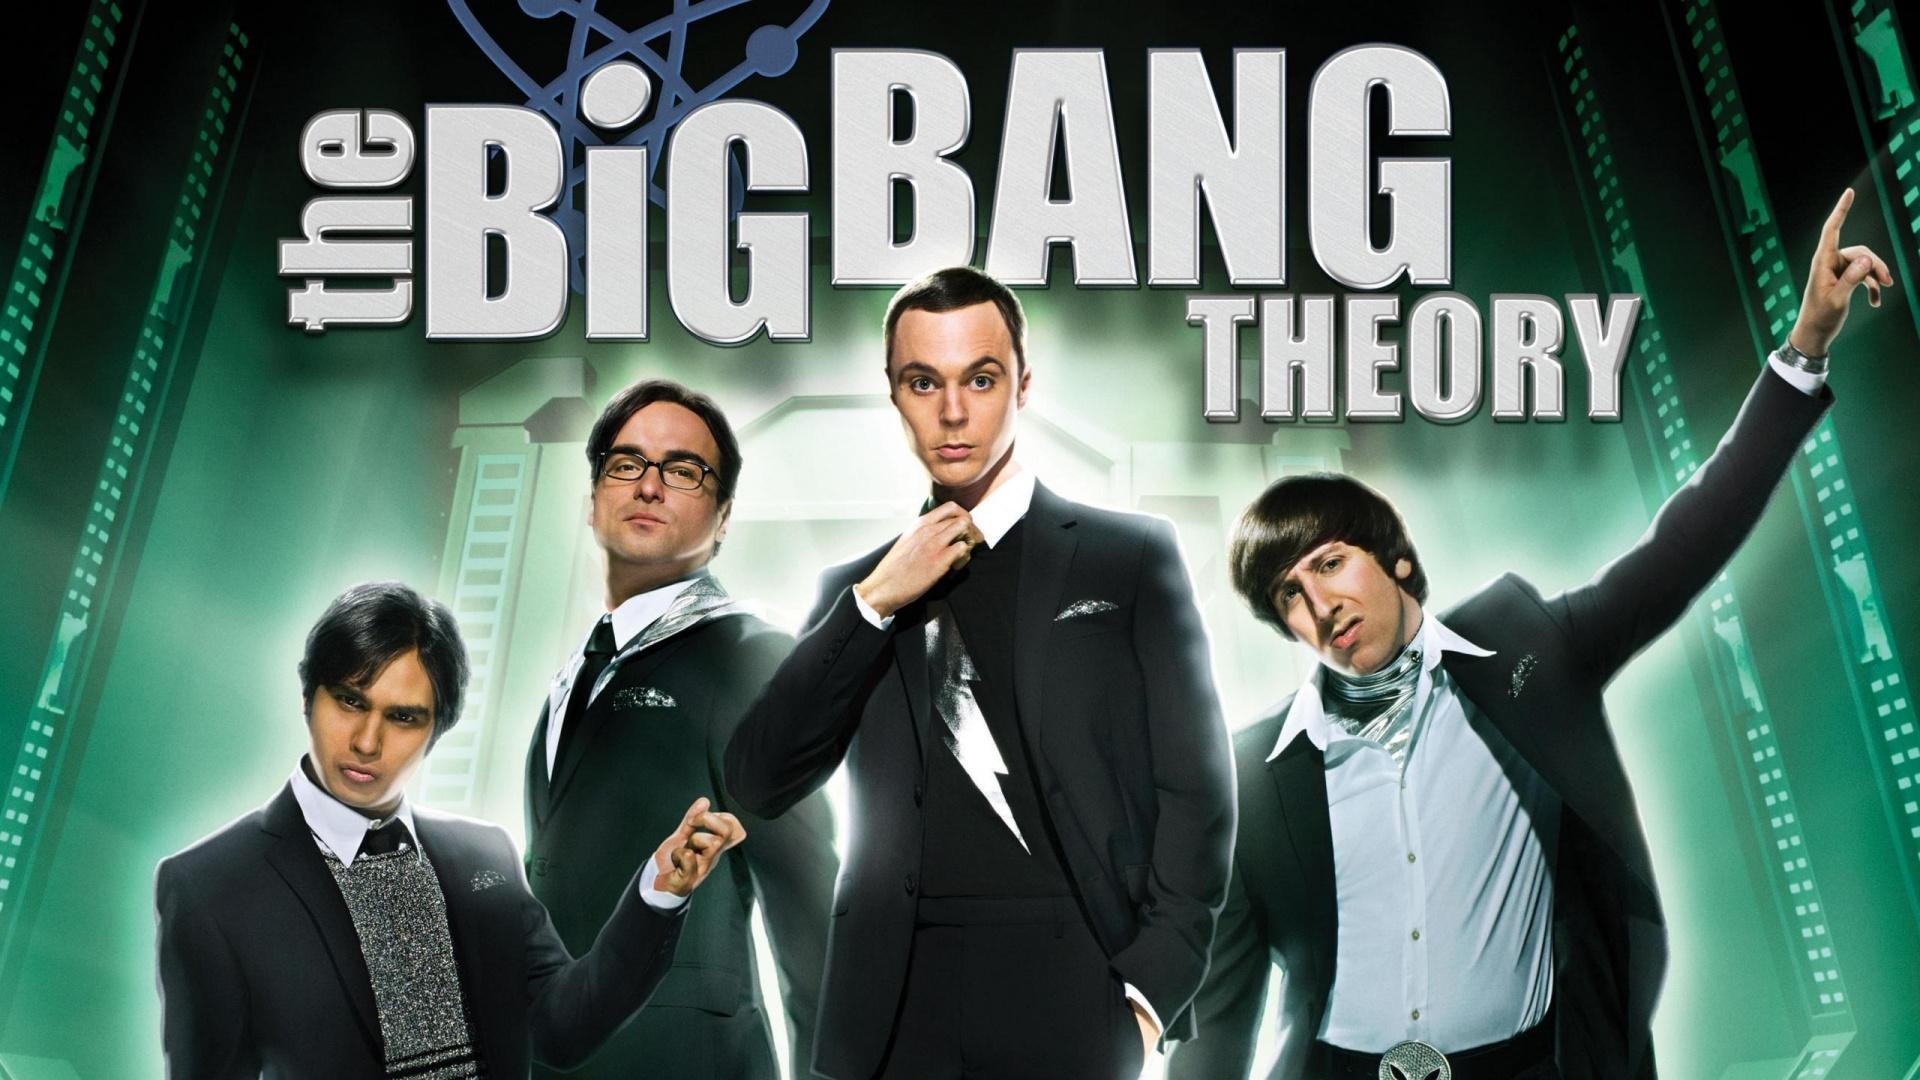 http://2.bp.blogspot.com/-3Yd2RIUoHVY/UIve8bI7CHI/AAAAAAAANDo/qPyGtp5rex0/s0/the-big-bang-theory-cool-1920x1080.jpg